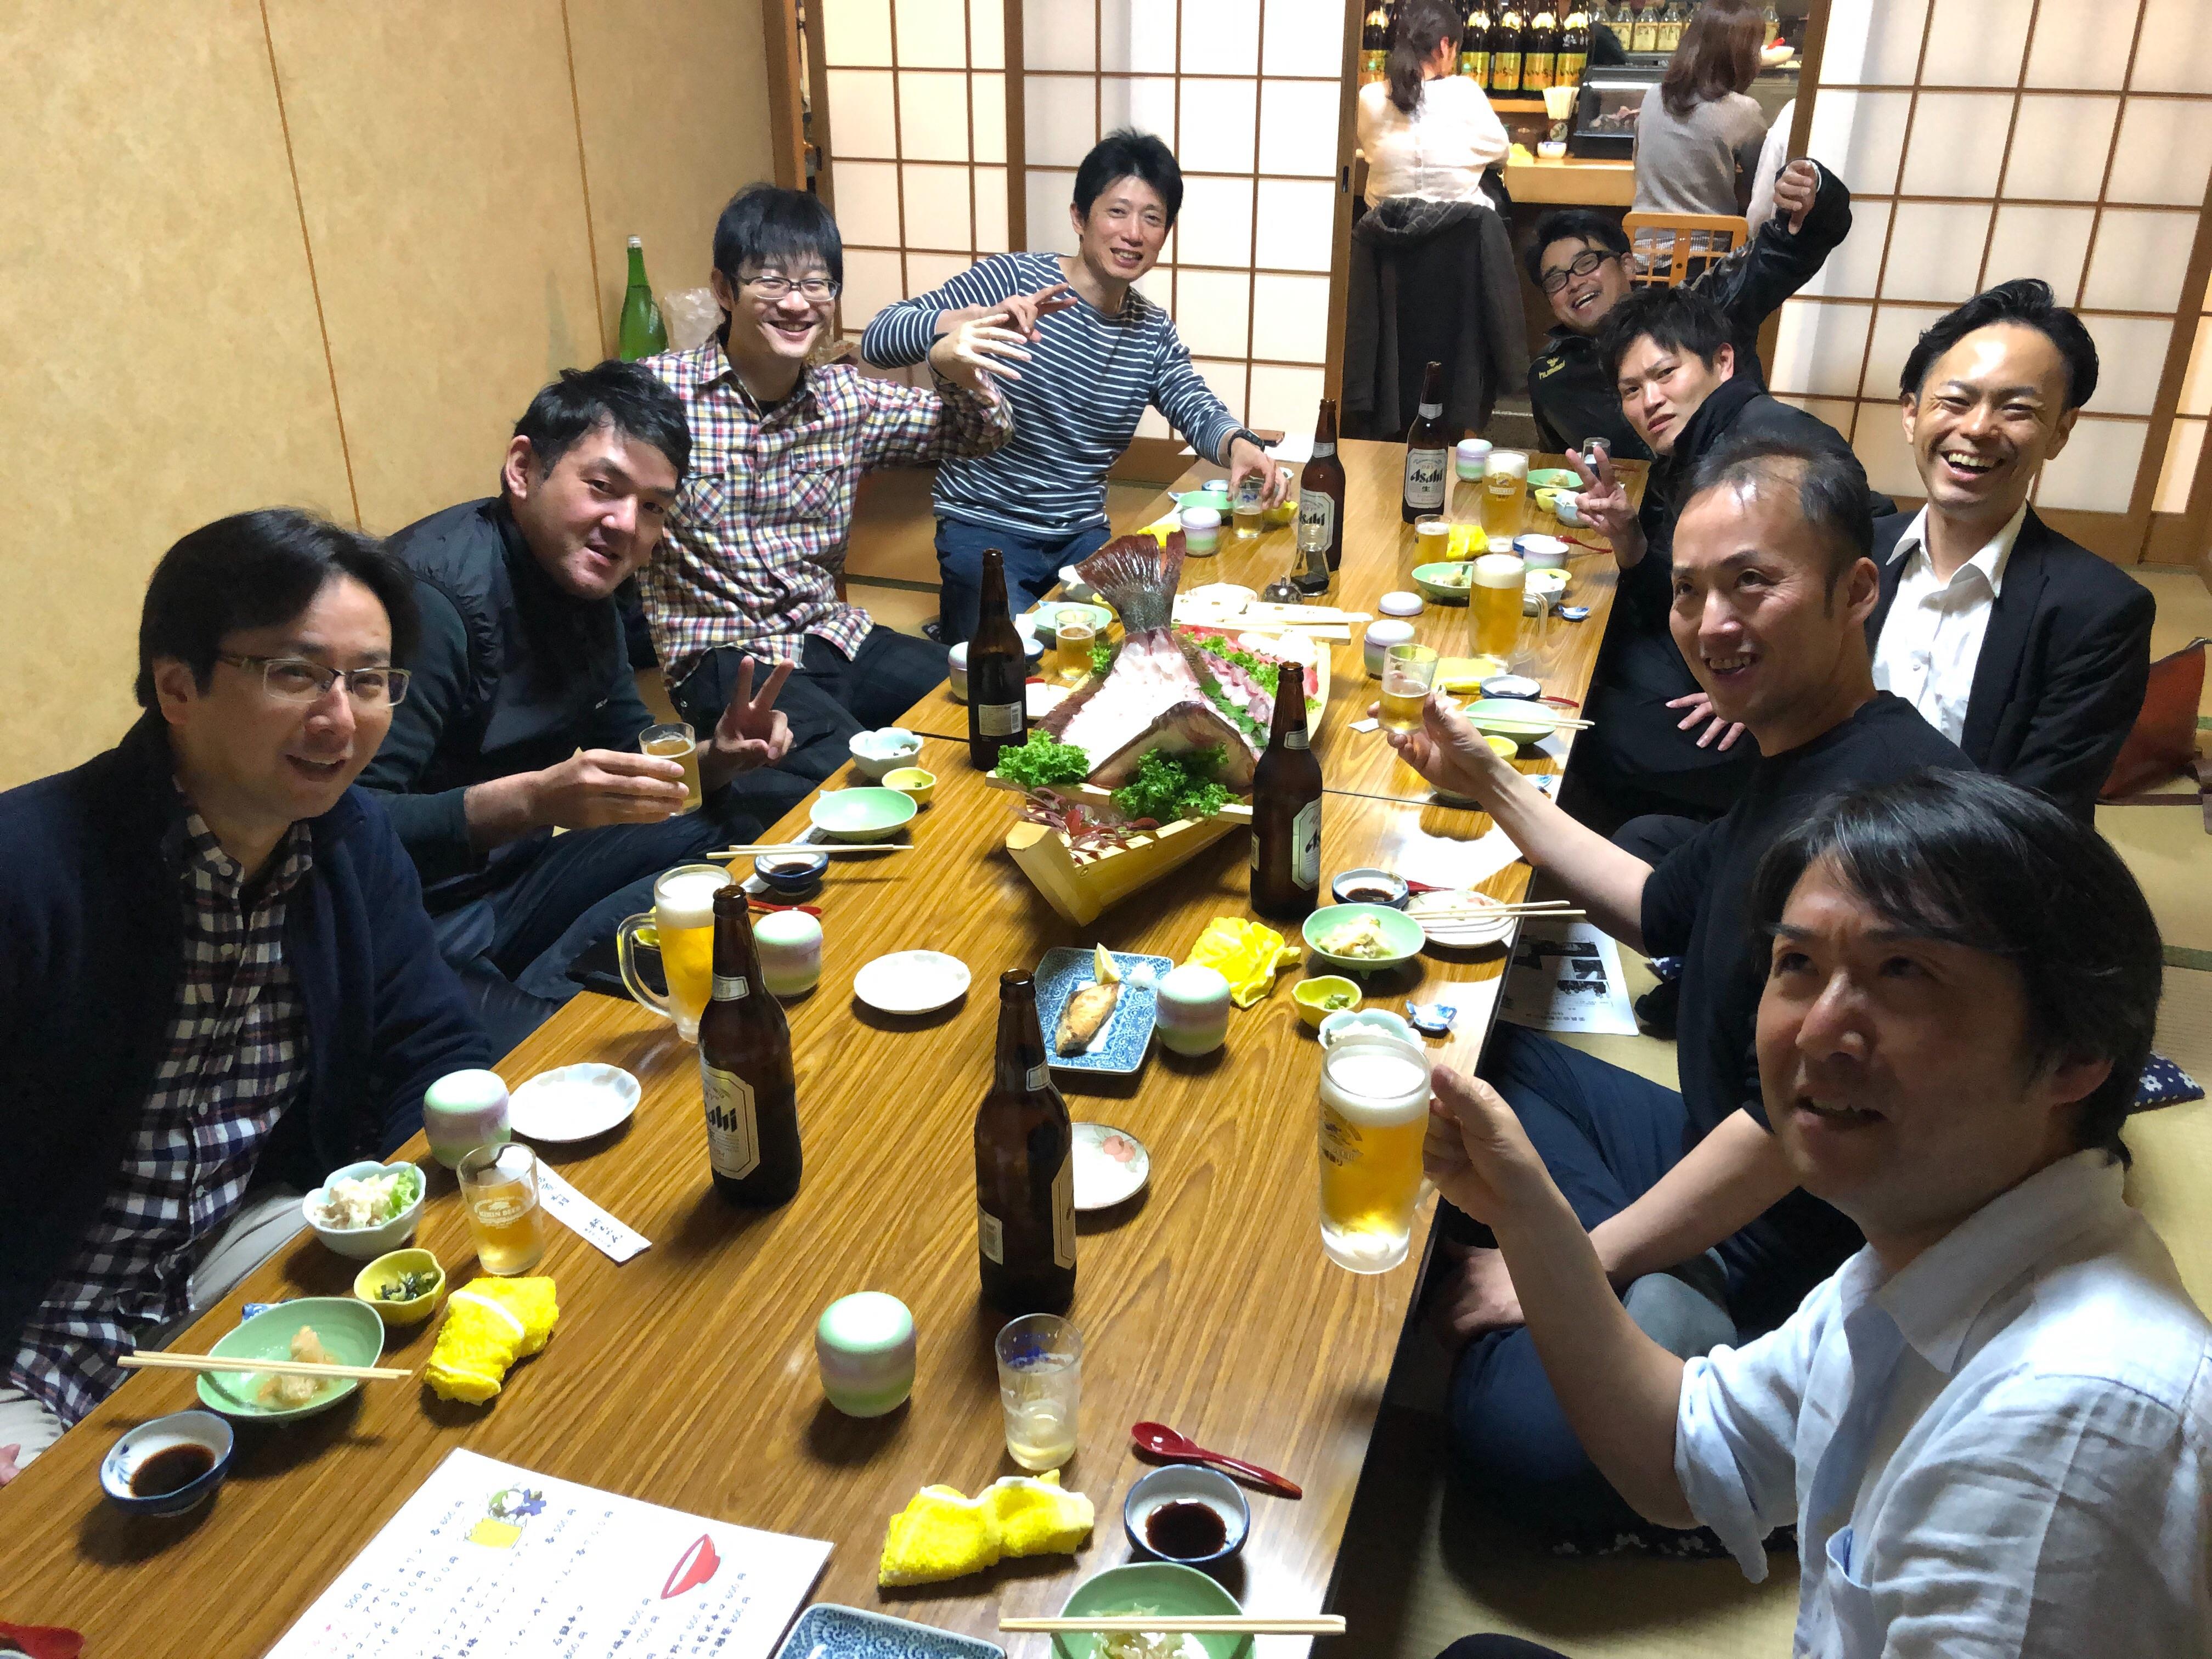 f:id:masanori-kato1972:20190330195011j:image